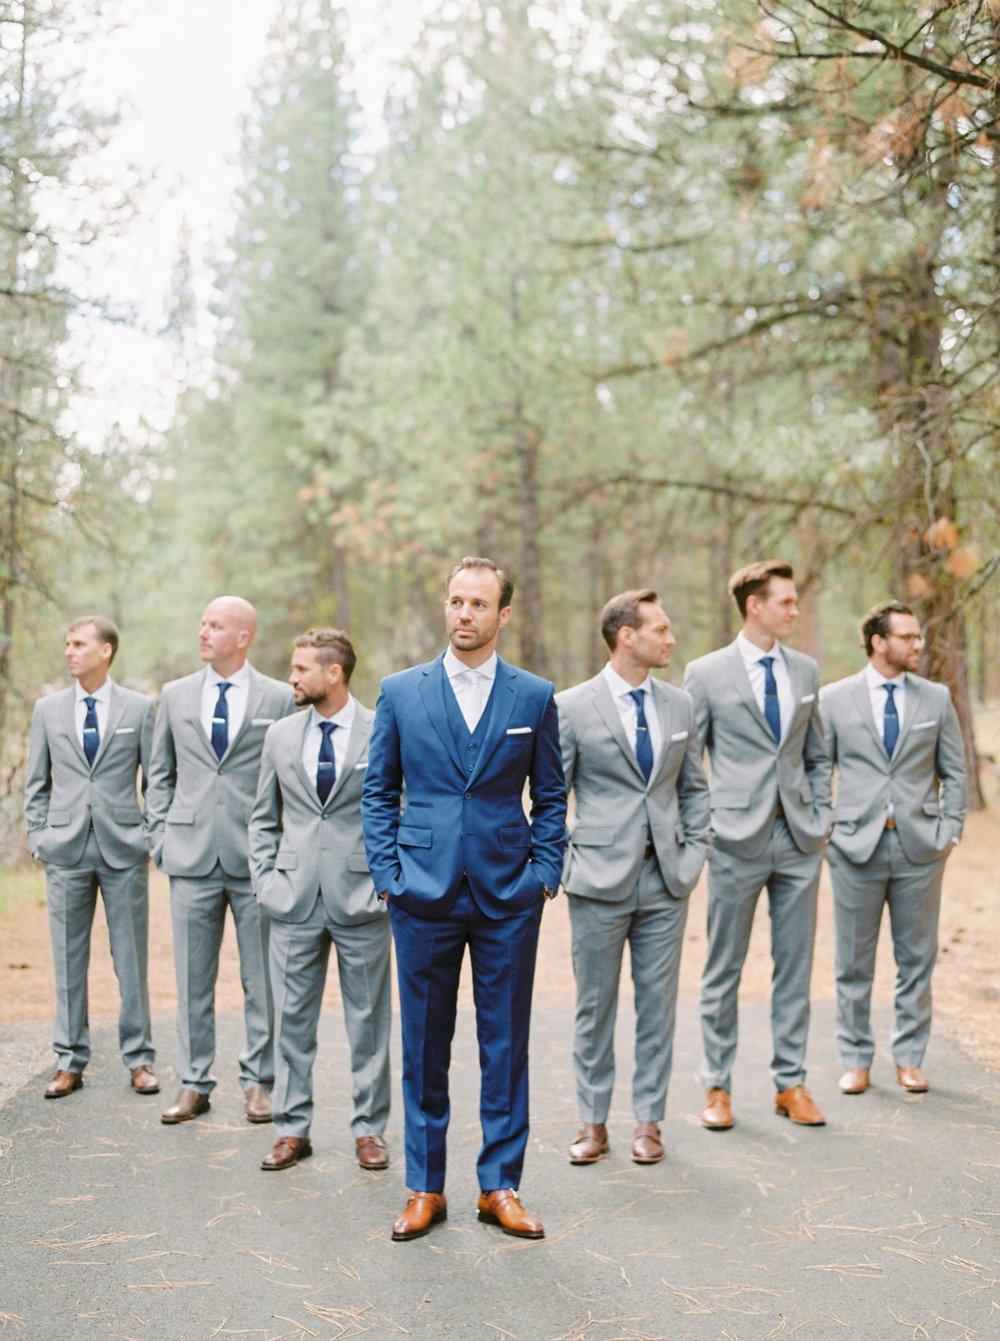 Calgary wedding photographers | oregon wedding photographers | fine art film | Justine Milton Photography | oregon wedding | groom portraits | groomsmen portraits | grey suit | blue suit